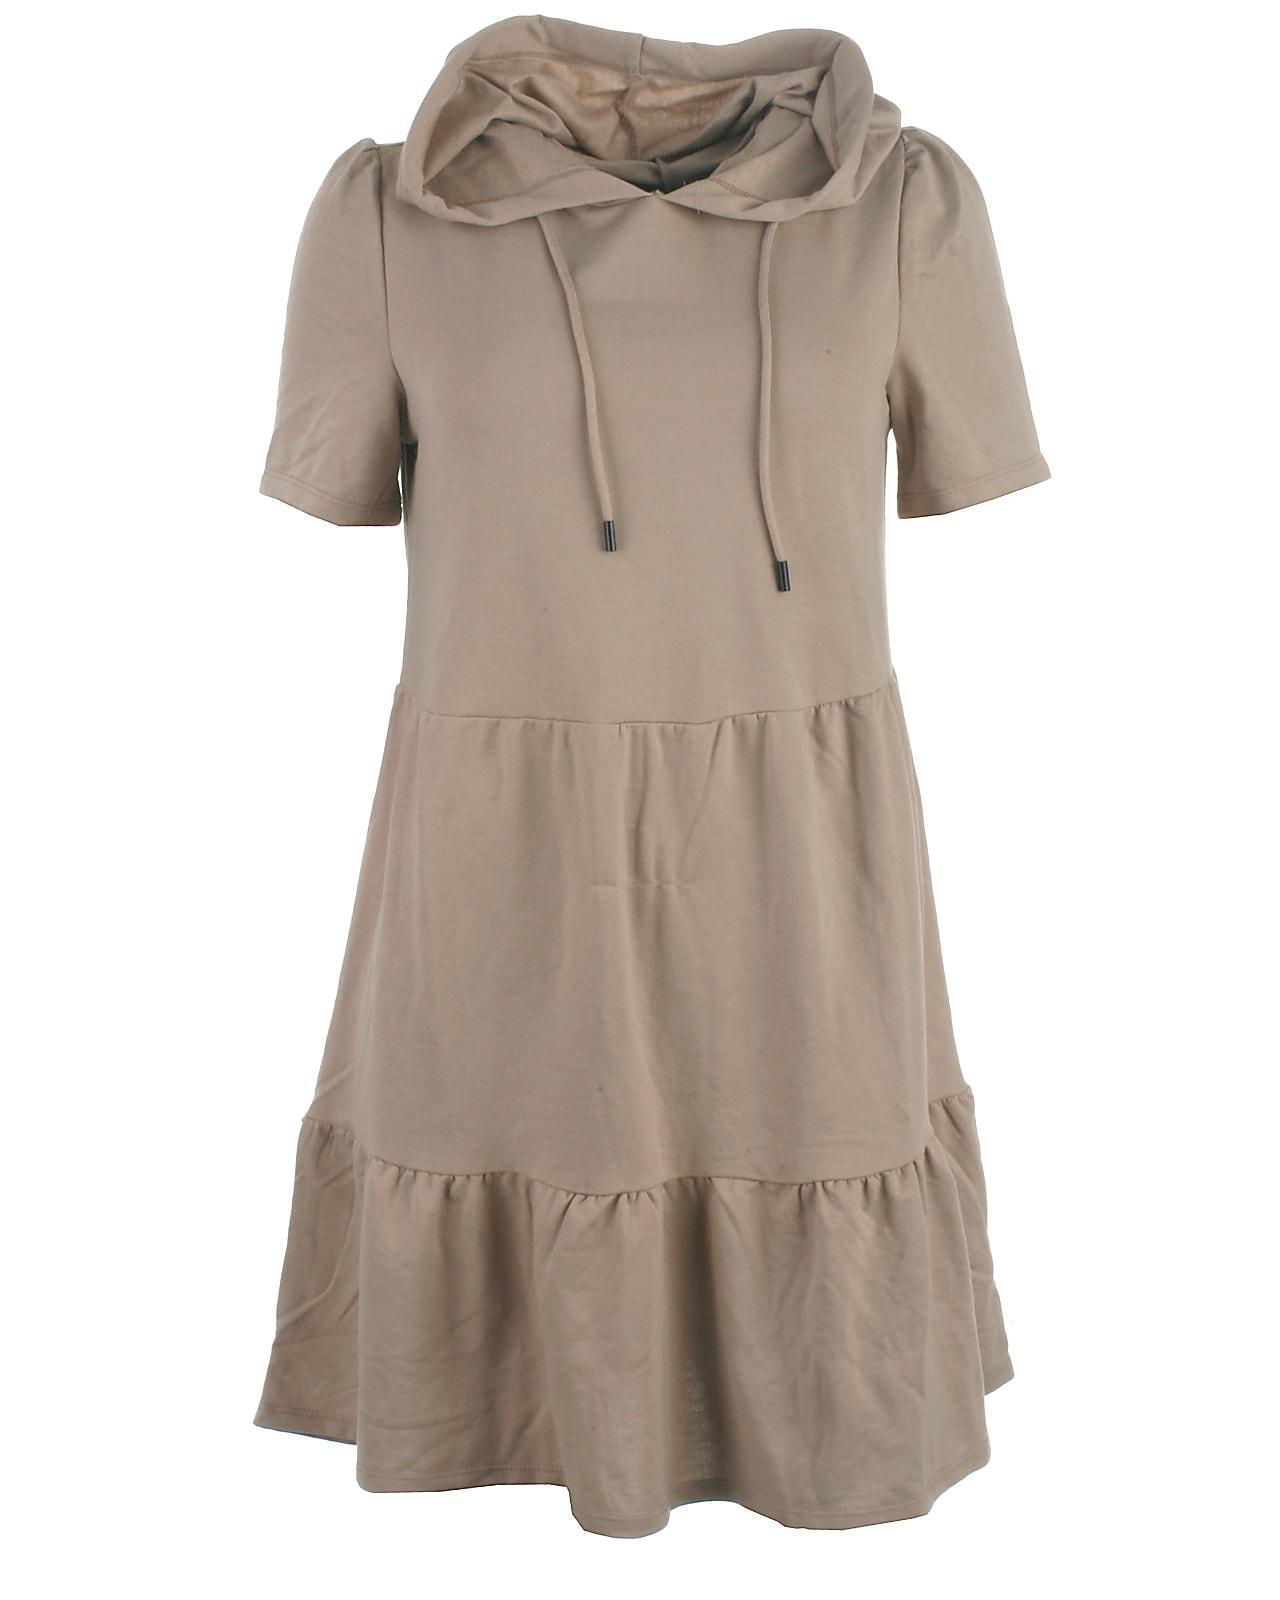 Jacqueline de Yong hood sweat kjole, Mary, simplytaupe